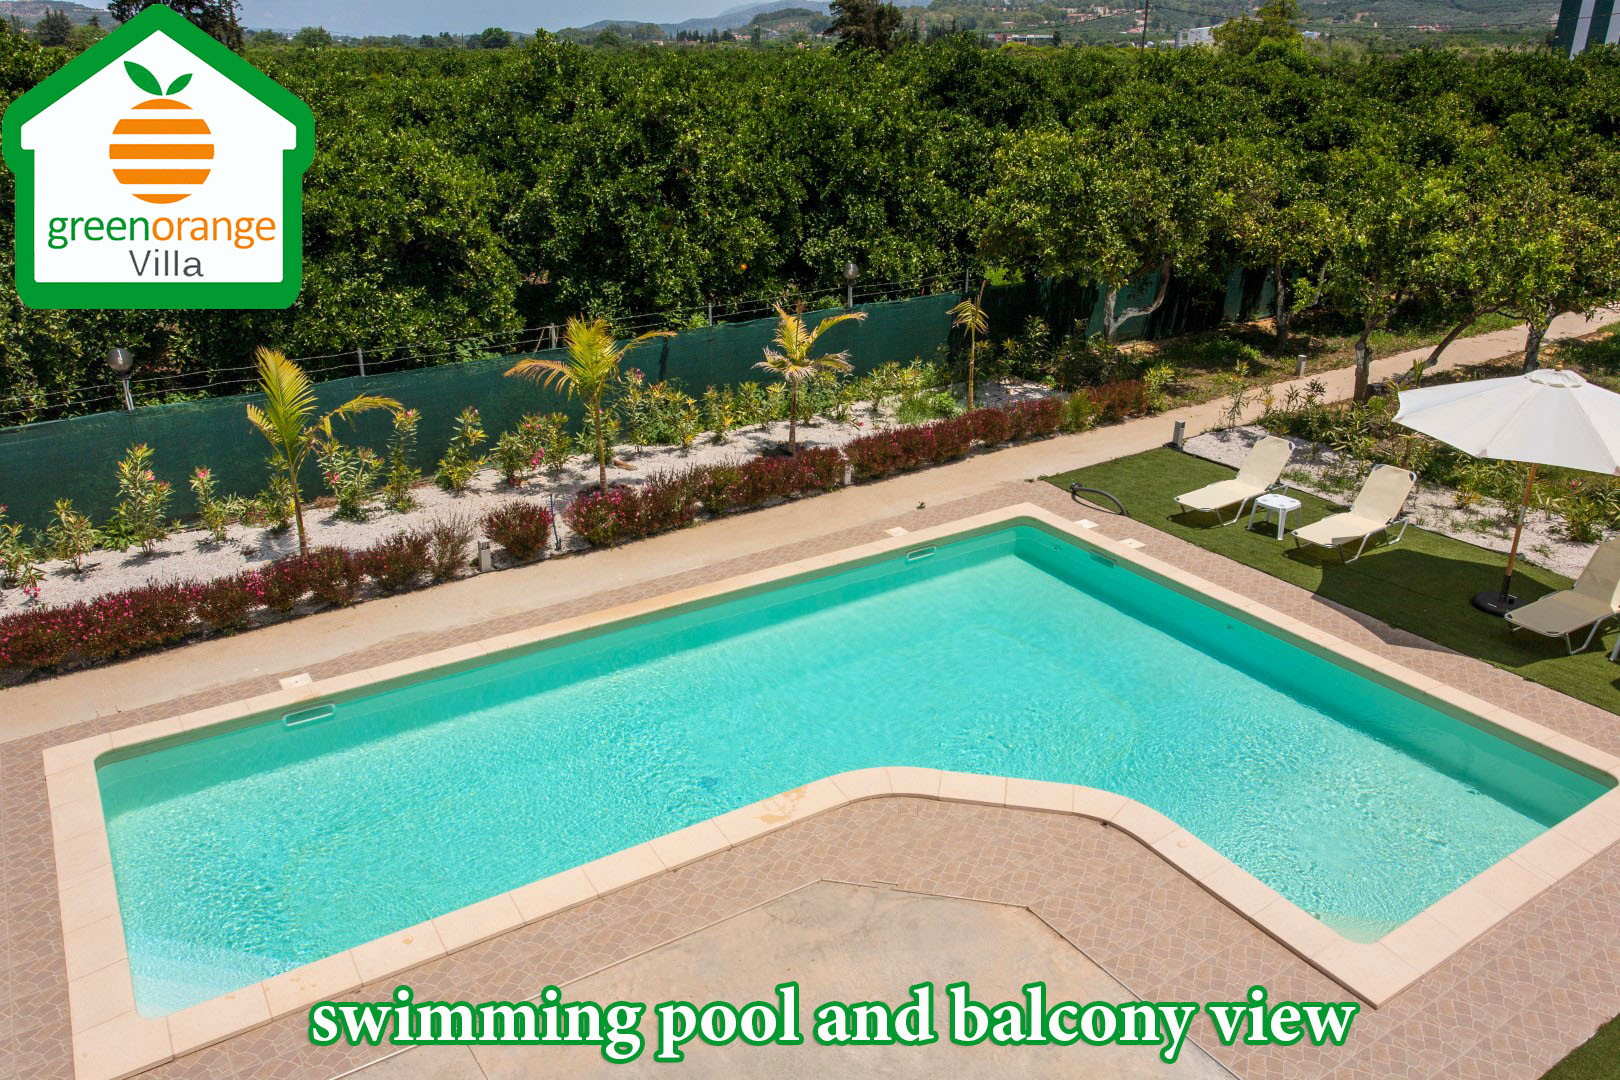 luxurious accommodation in cahania Crete Greece, Villa farm Green Orange Villa